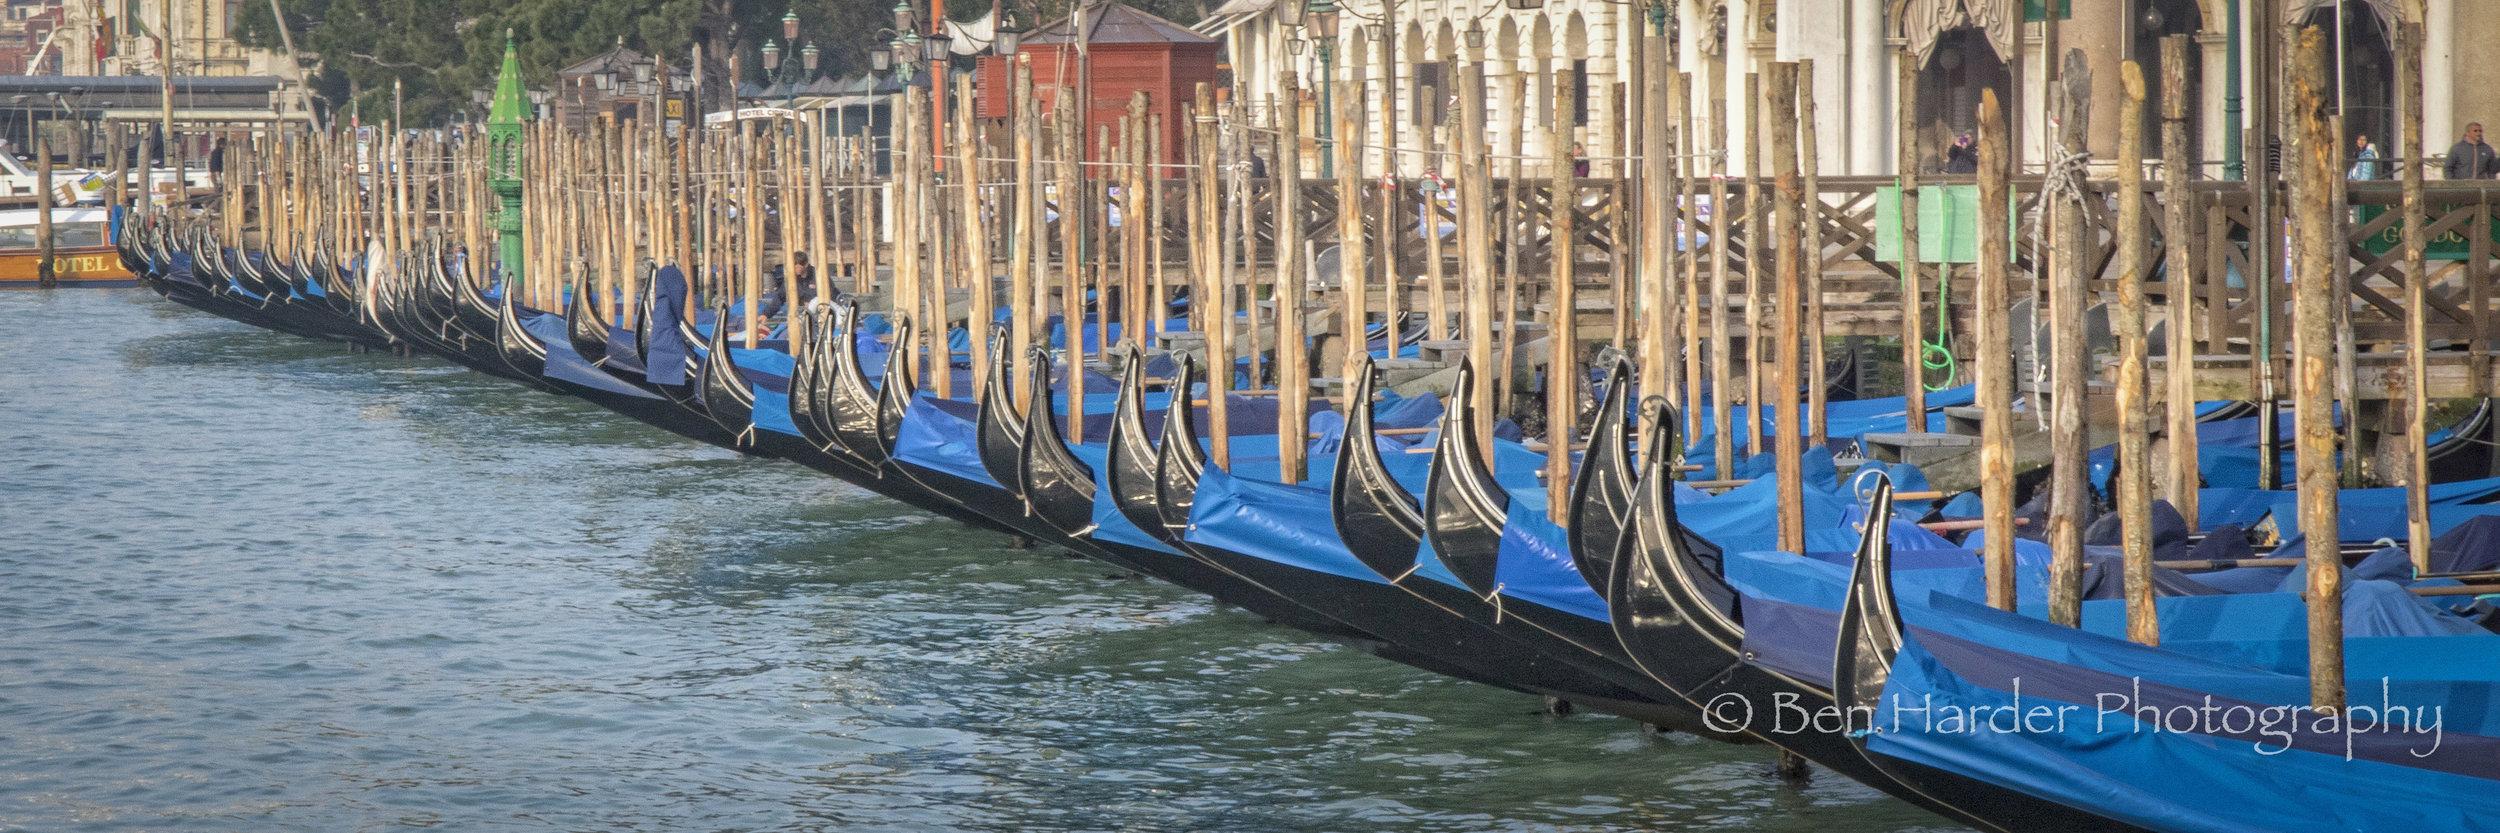 """Starting Line"" - Venice, Italy"